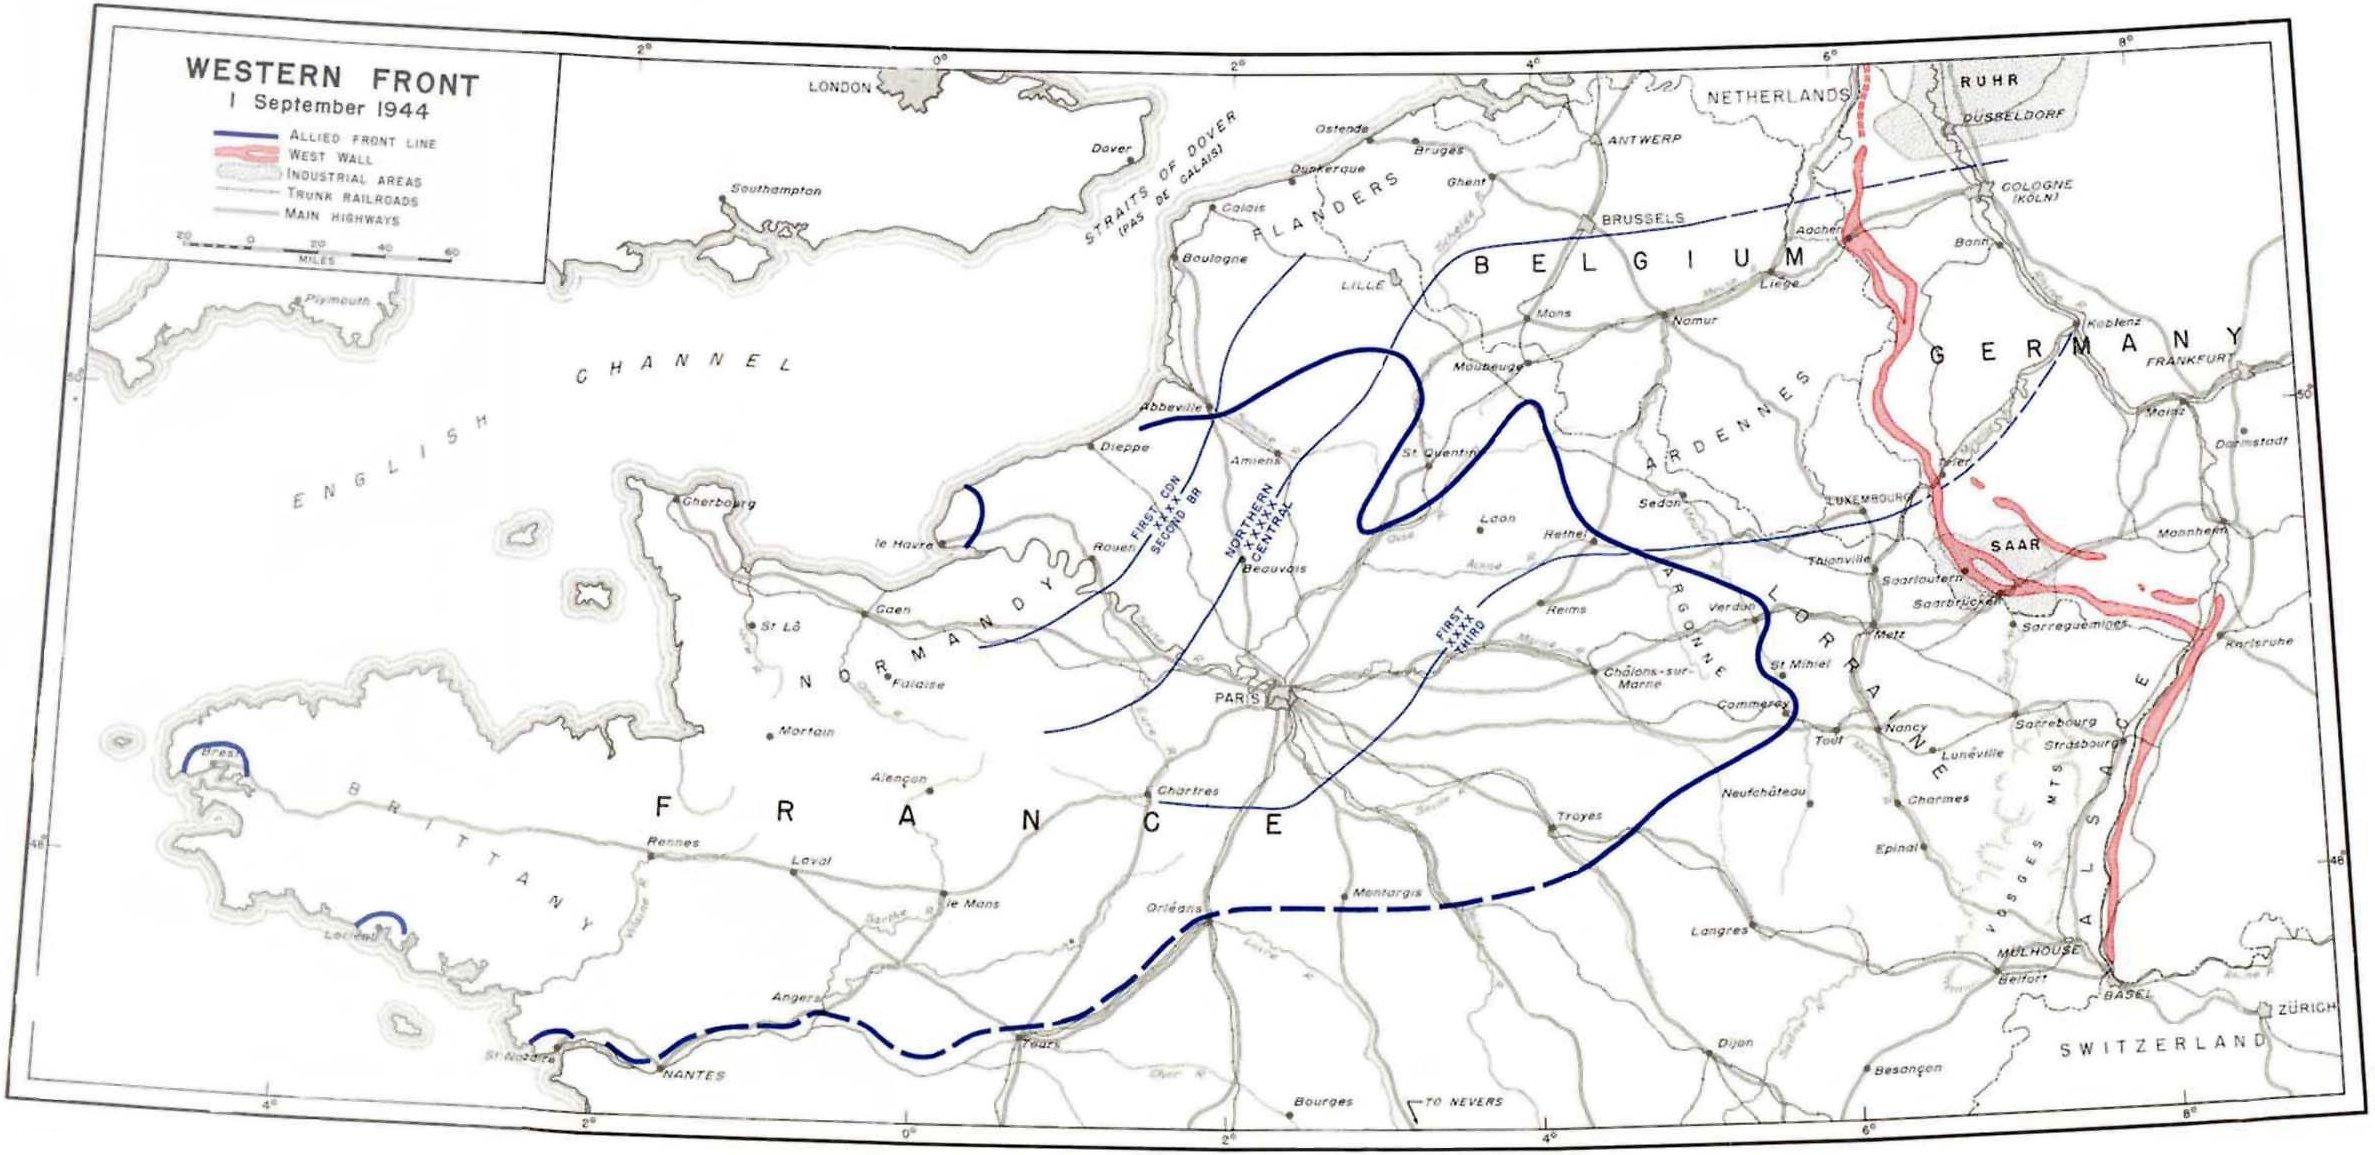 http://upload.wikimedia.org/wikipedia/commons/e/e4/Western_Front_-_1_Sep_1944.jpg